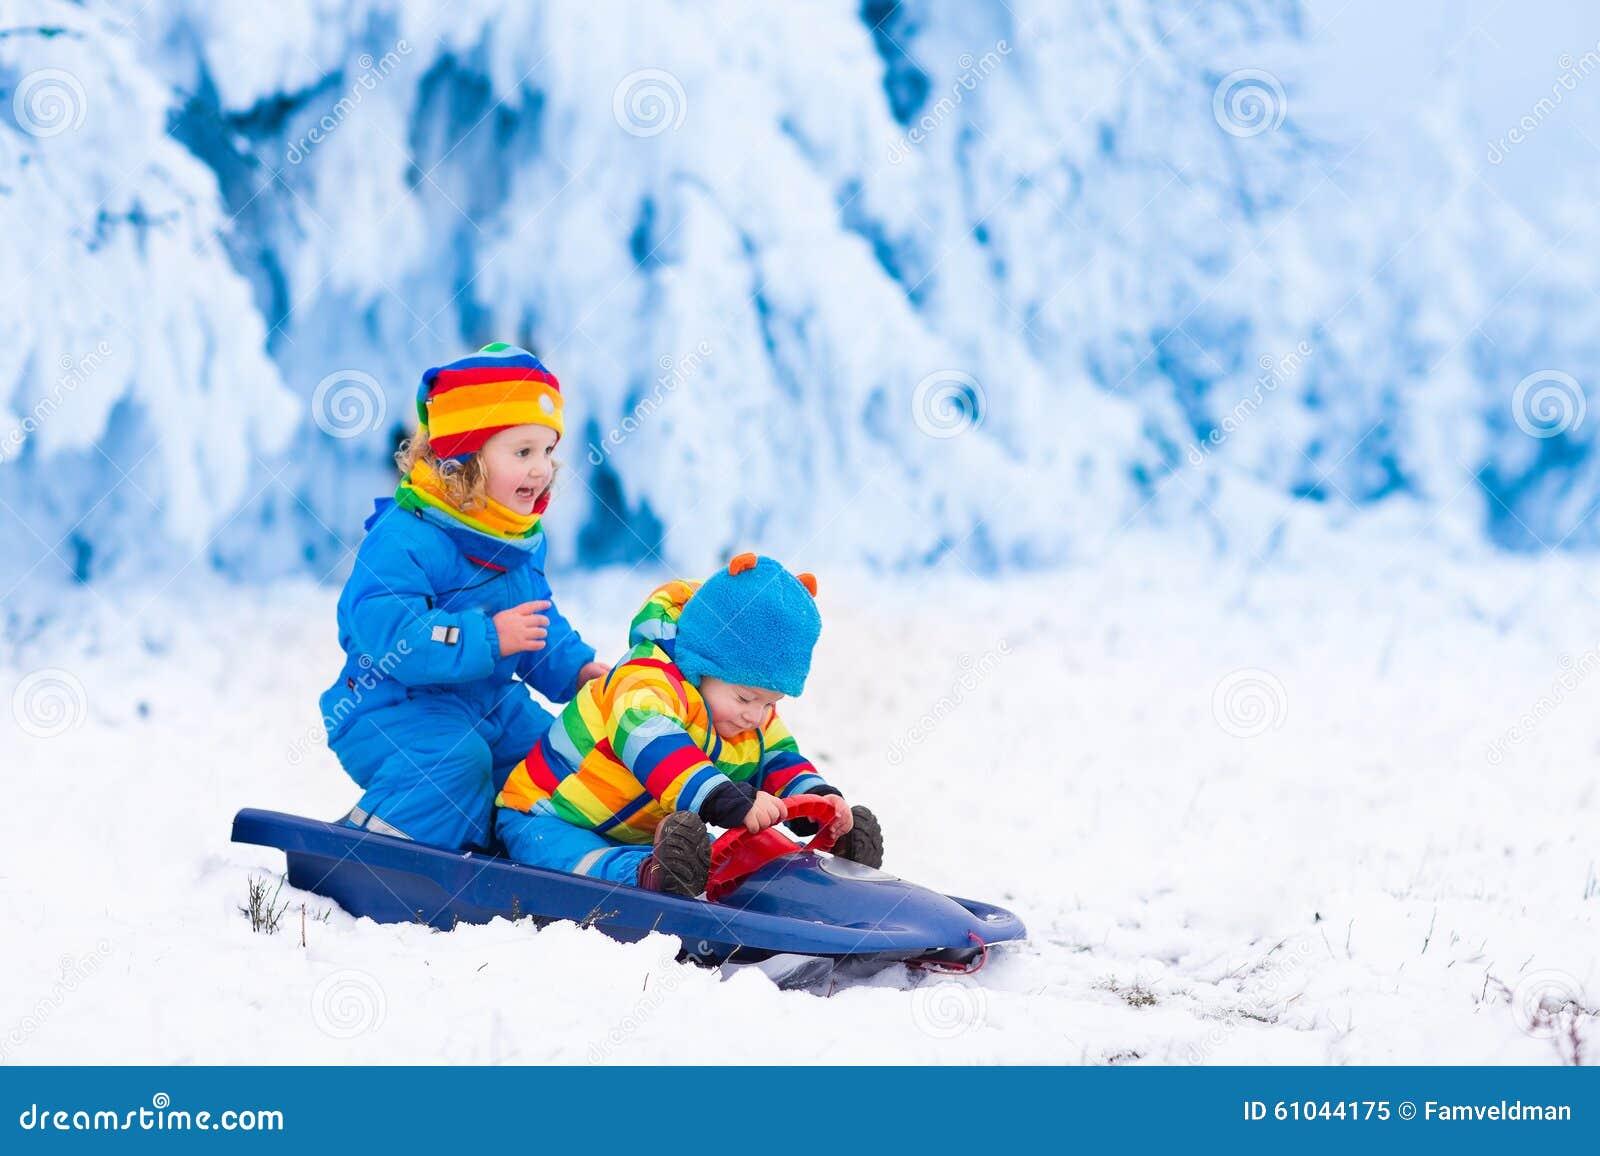 Fun Kids Area Outdoors Winter